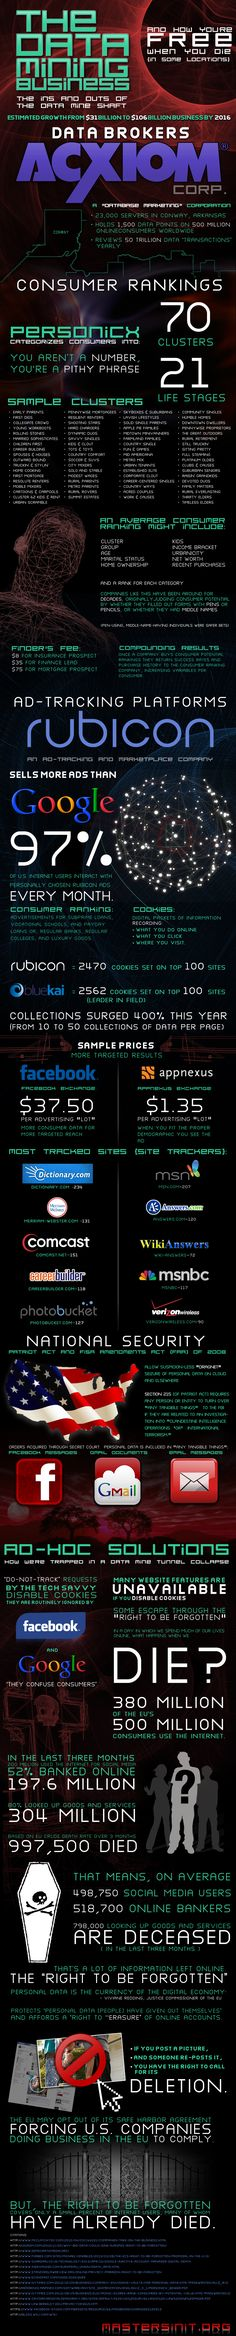 The Data Mining Business #infografia #infographic